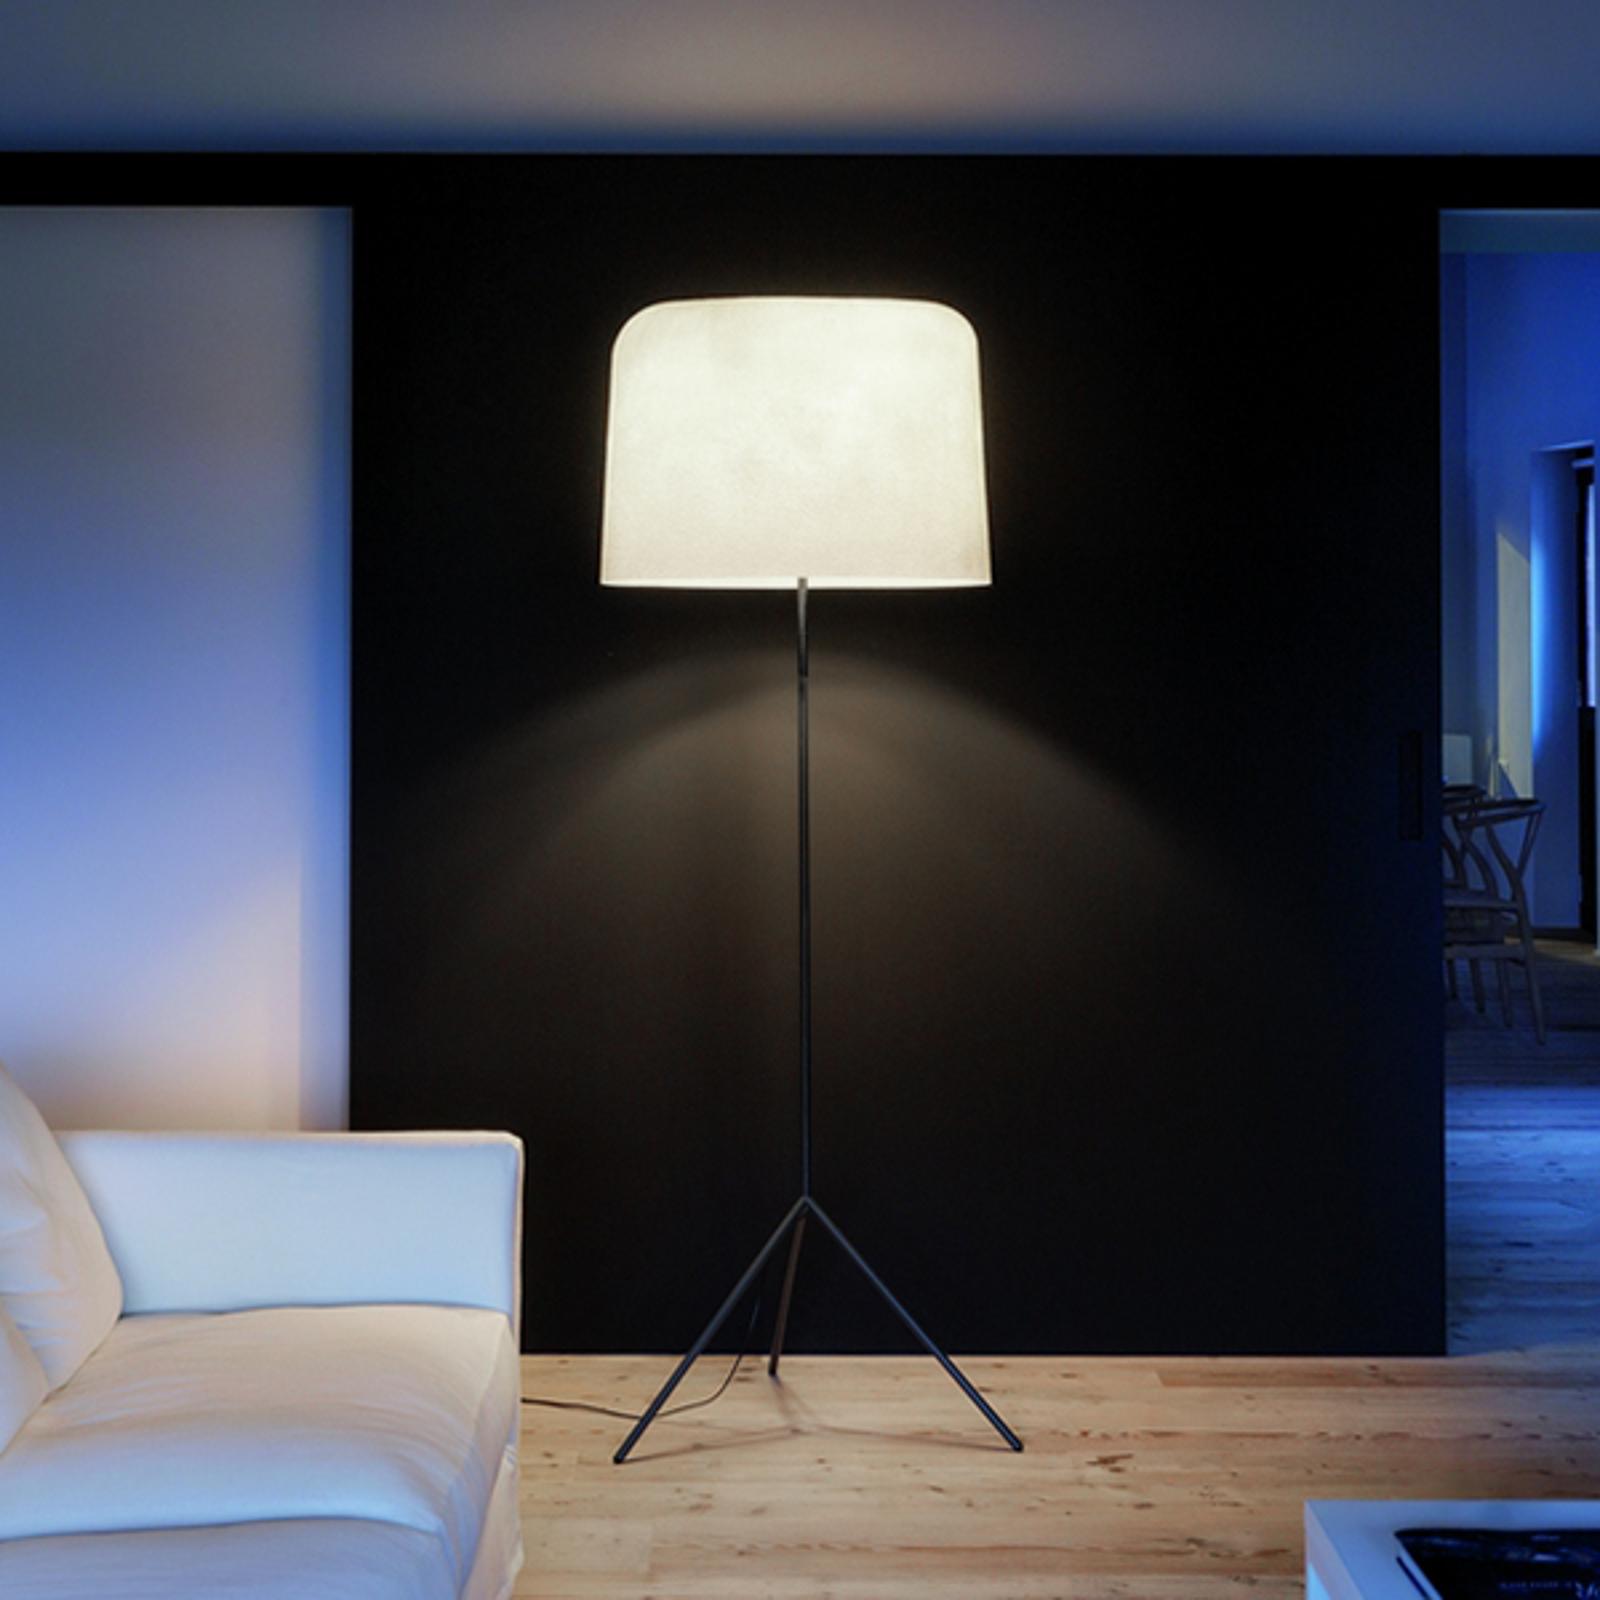 Met een kap van fiberglas - vloerlamp Ola, wit